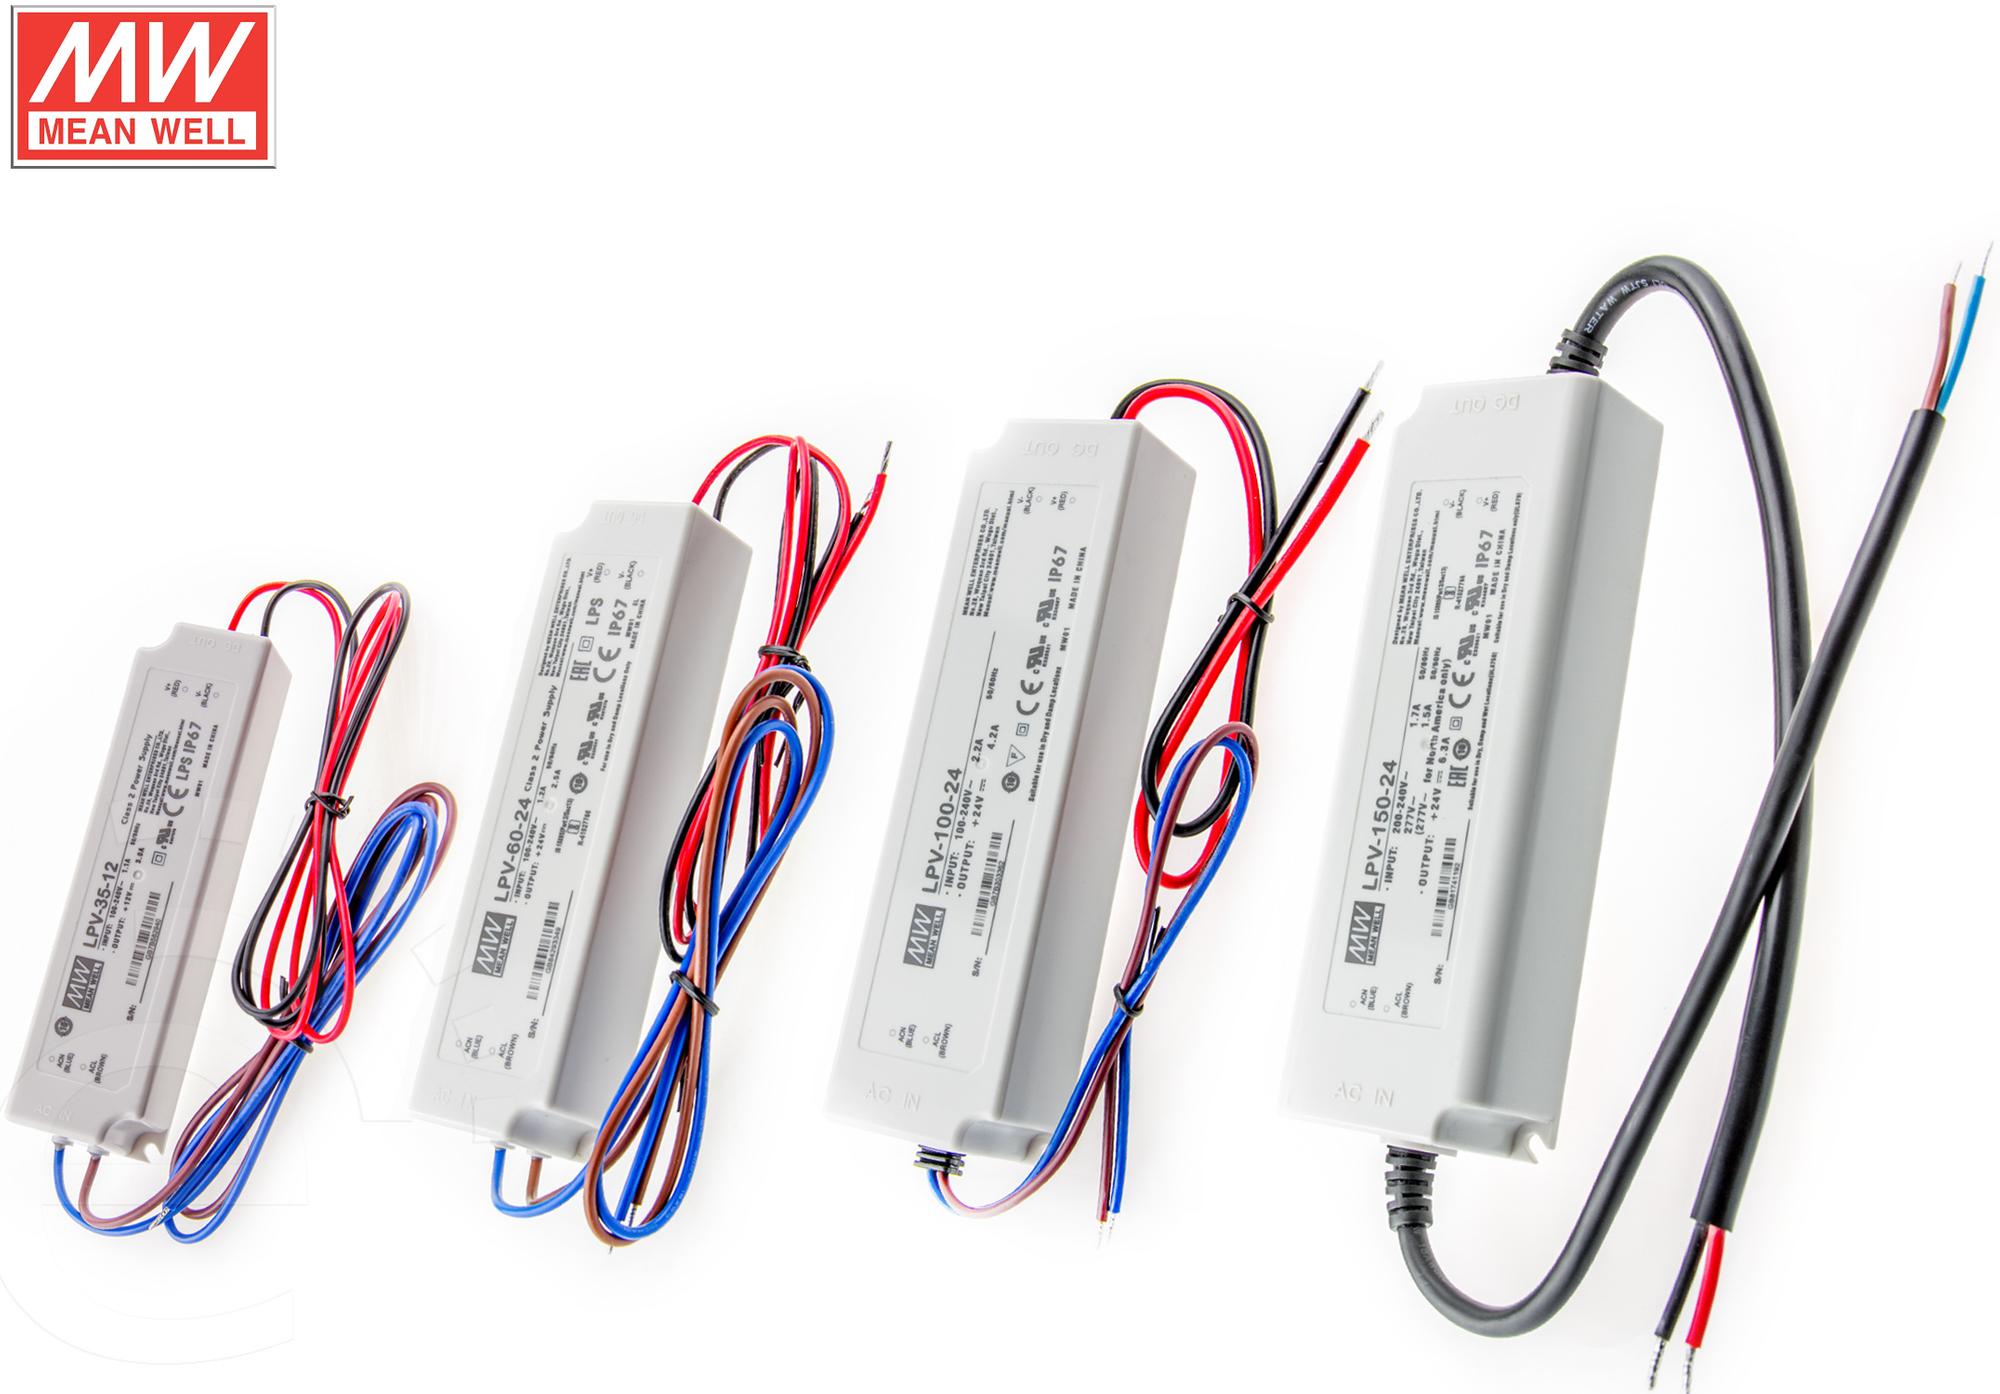 LPV- Serie MEANWELL IP67 5V 12V 24V 48V 20W - 153,6Watt LED Netzteil Schaltnetzteil Trafo Netzgerät Außen